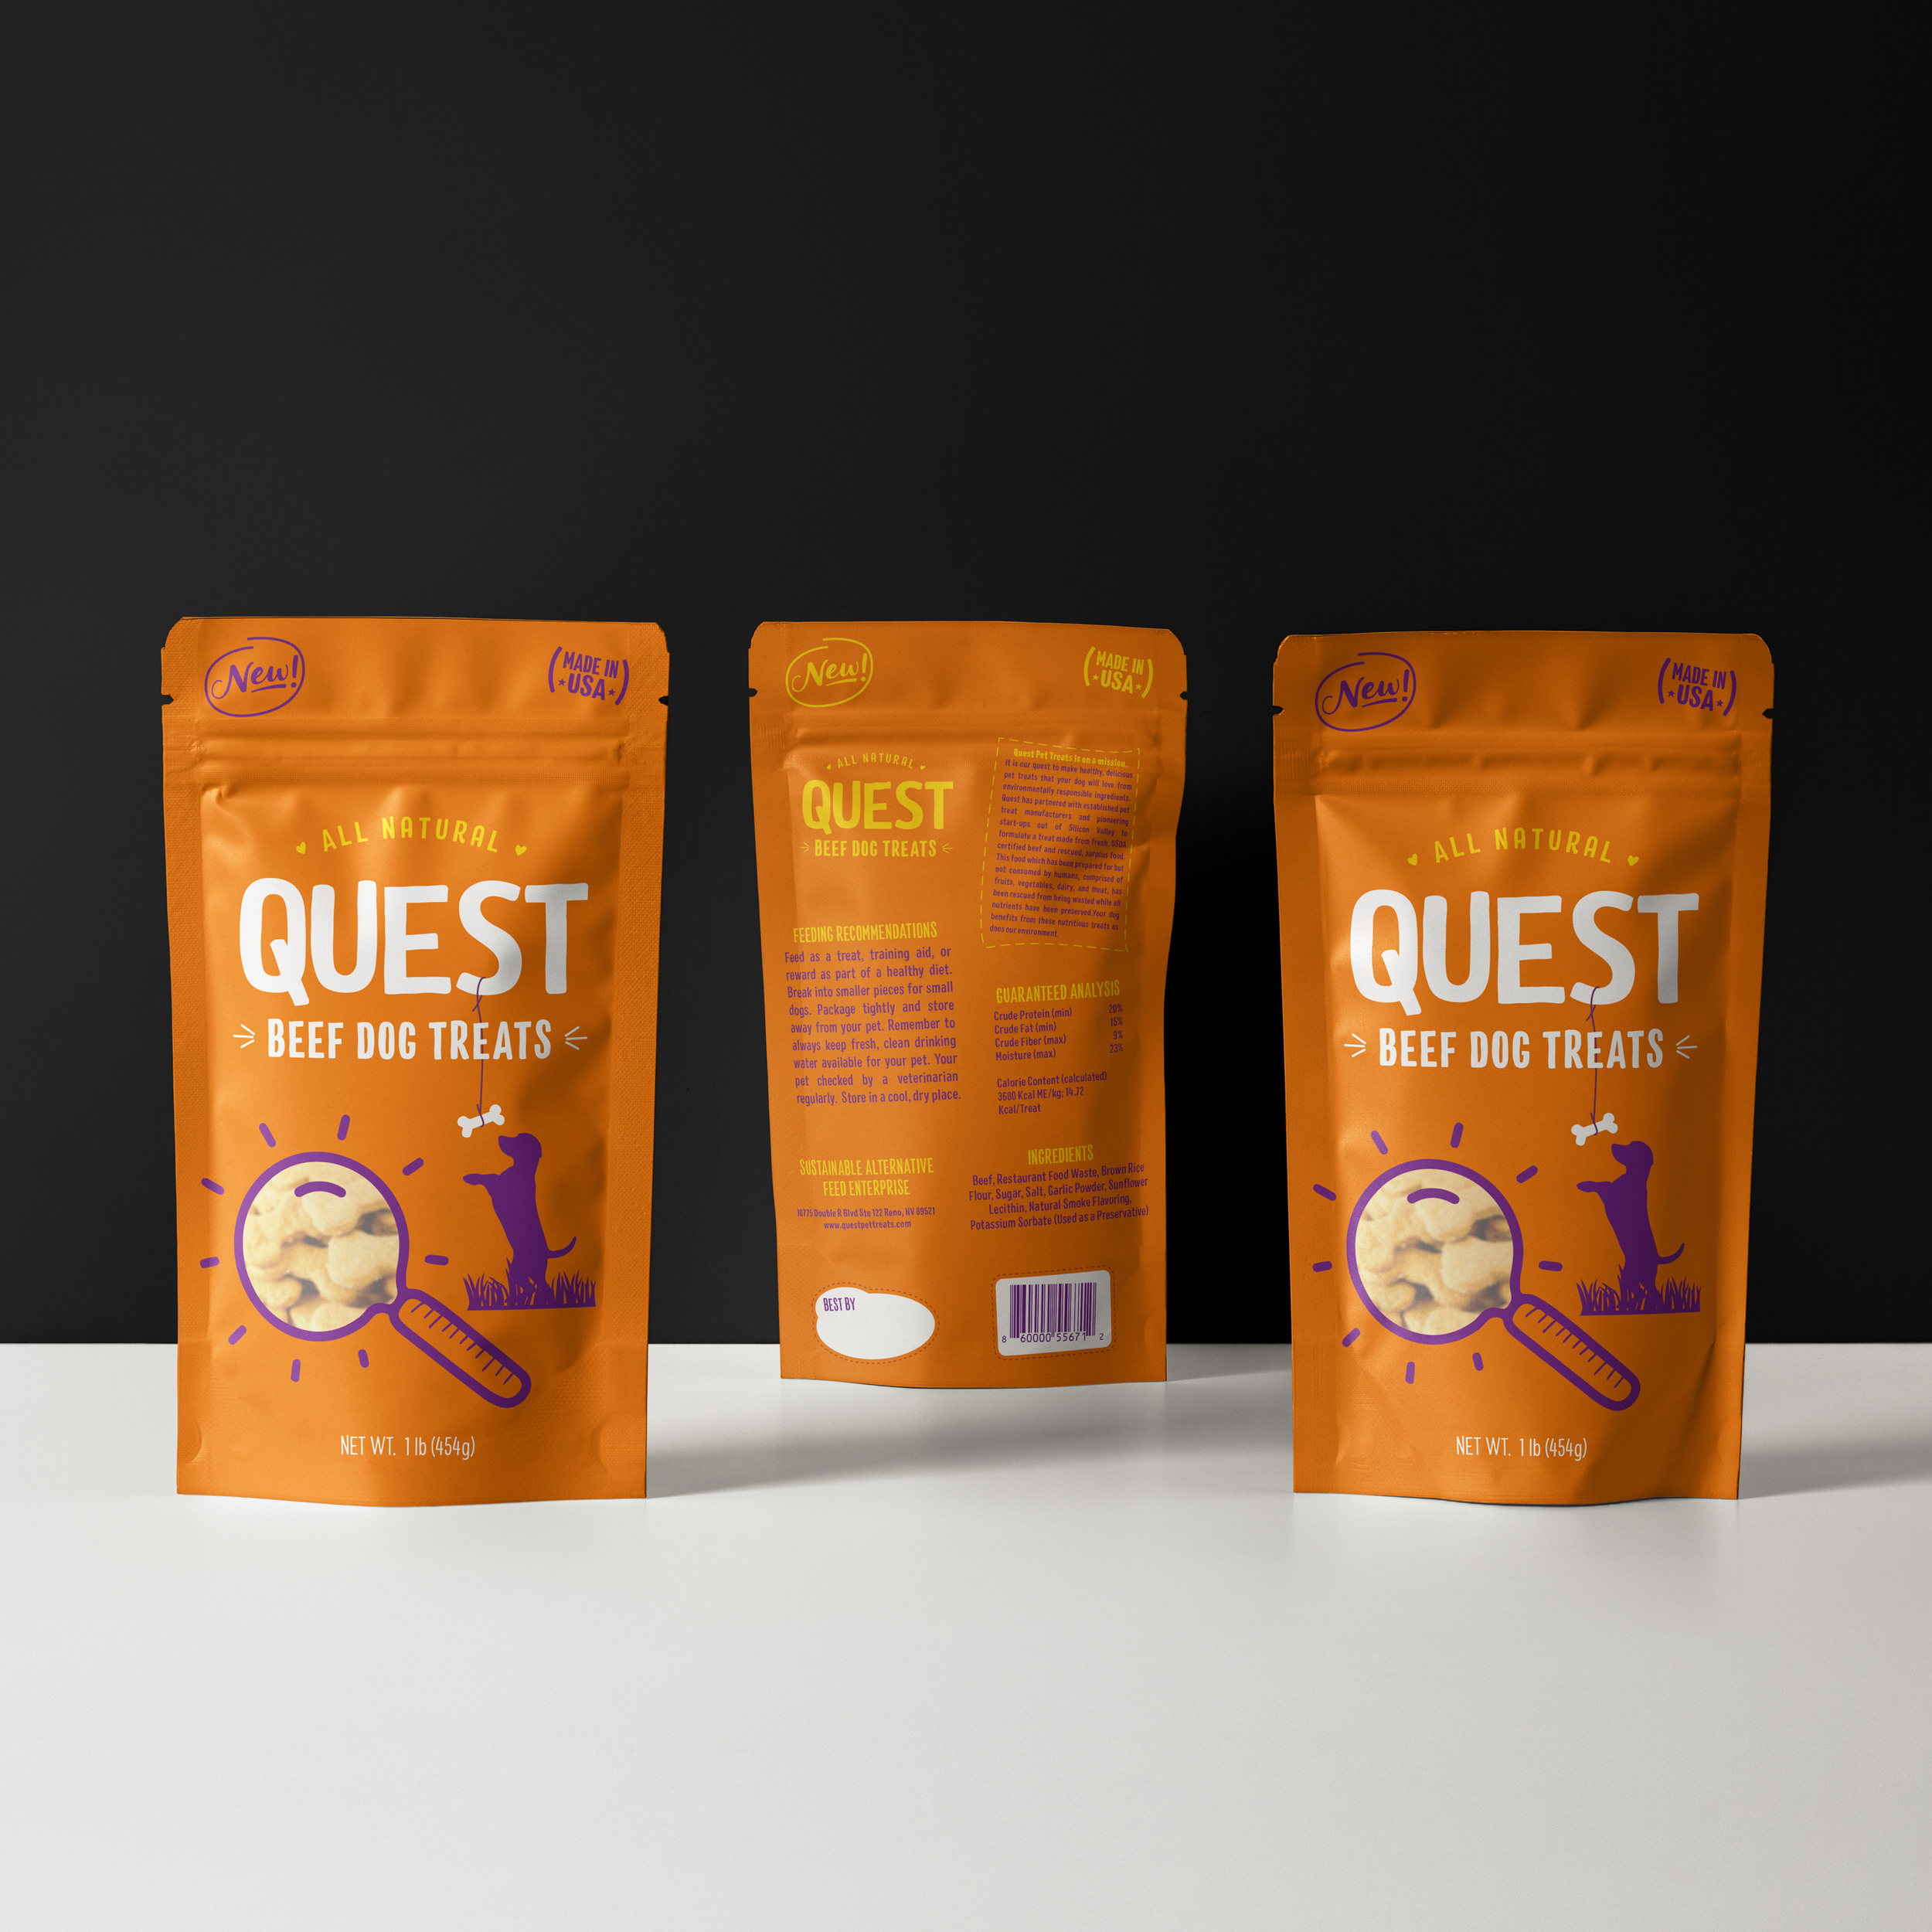 Quest Packaging Design / World Brand Design Society